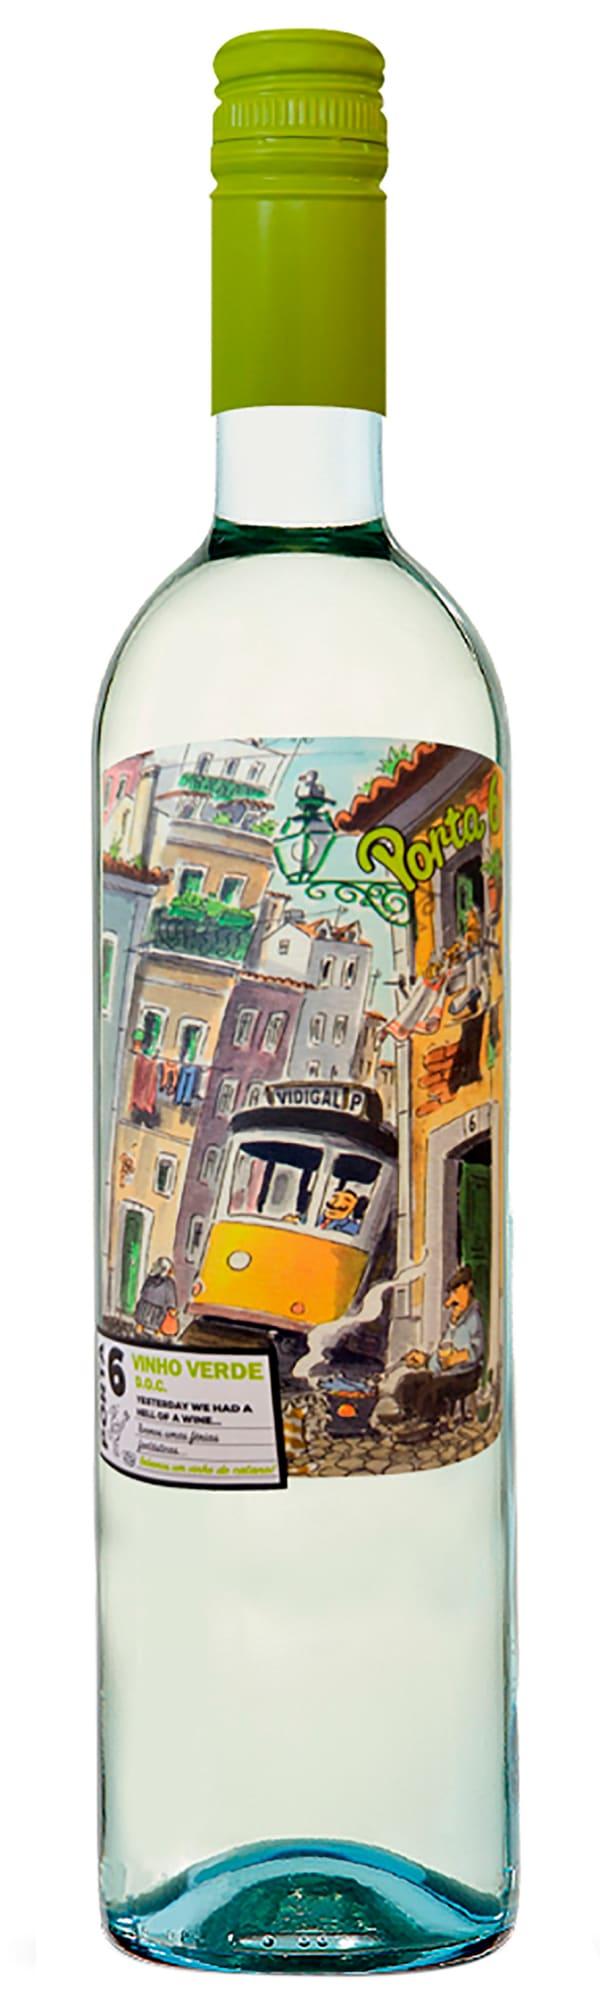 Porta 6 Vinho Verde 2018